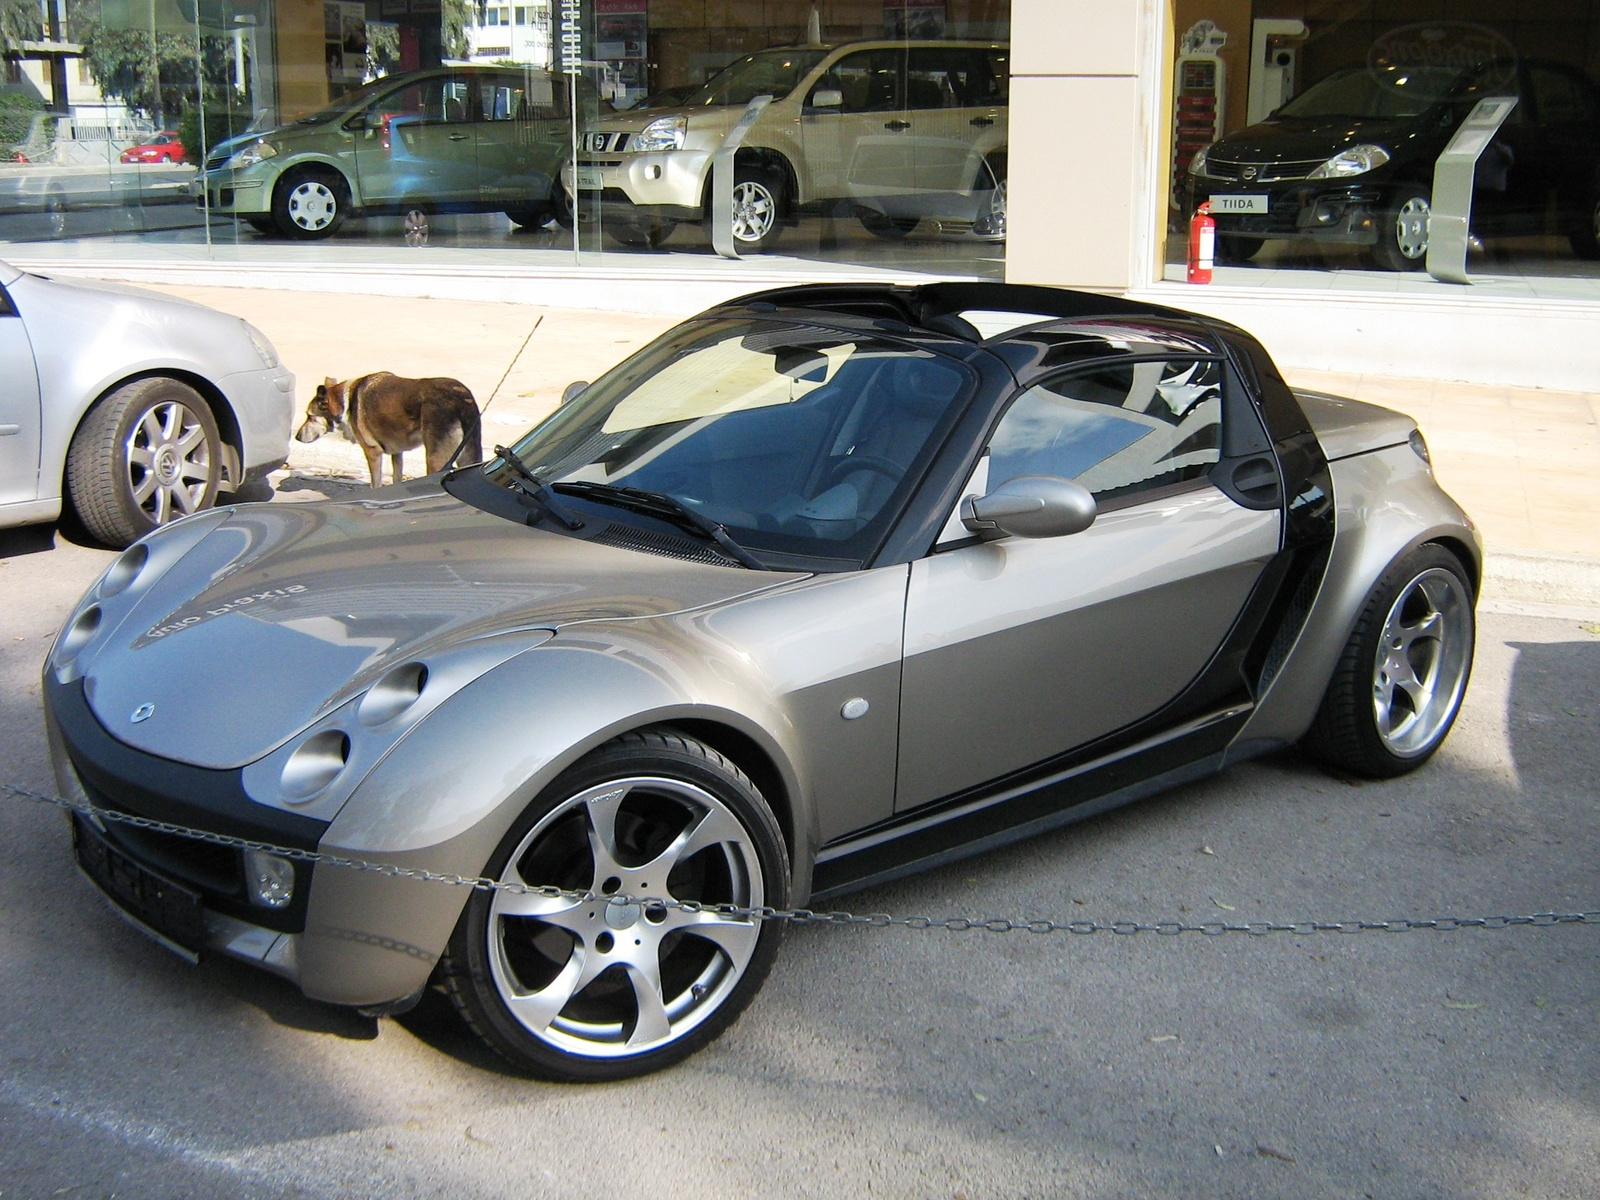 2004 smart roadster pictures cargurus. Black Bedroom Furniture Sets. Home Design Ideas